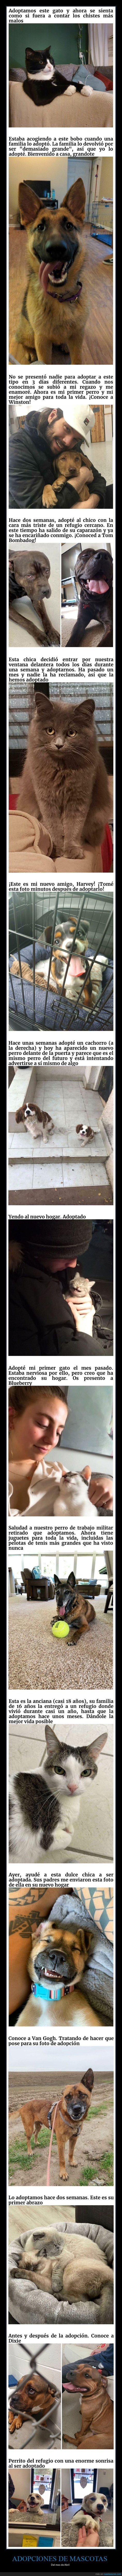 adopciones,mascotas